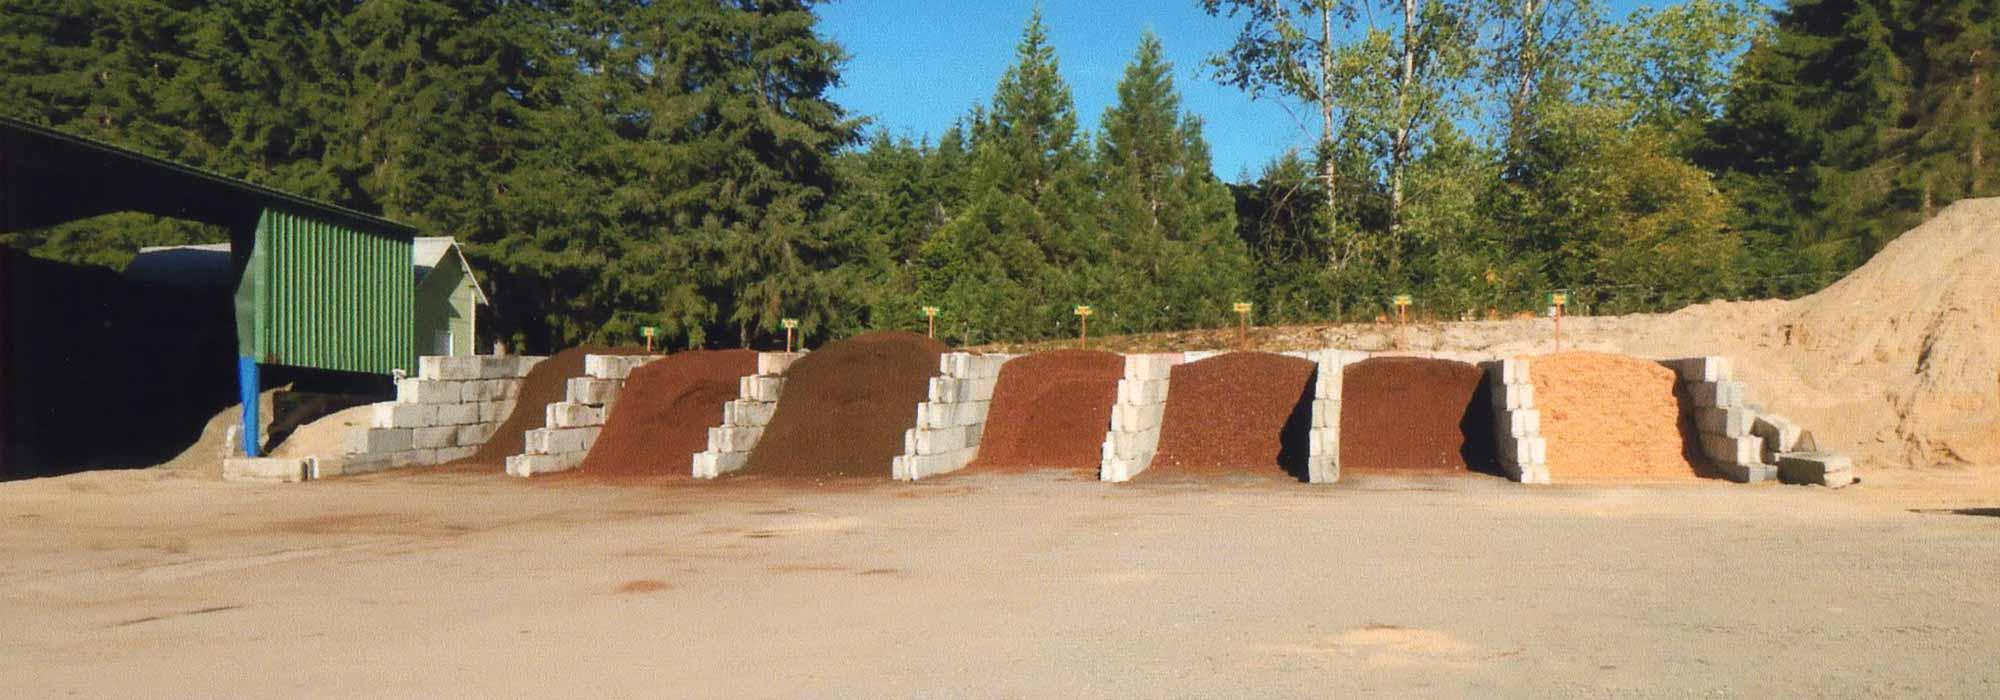 Landscape supply kitsap county 28 images topsoil bark for Landscaping rocks kitsap county